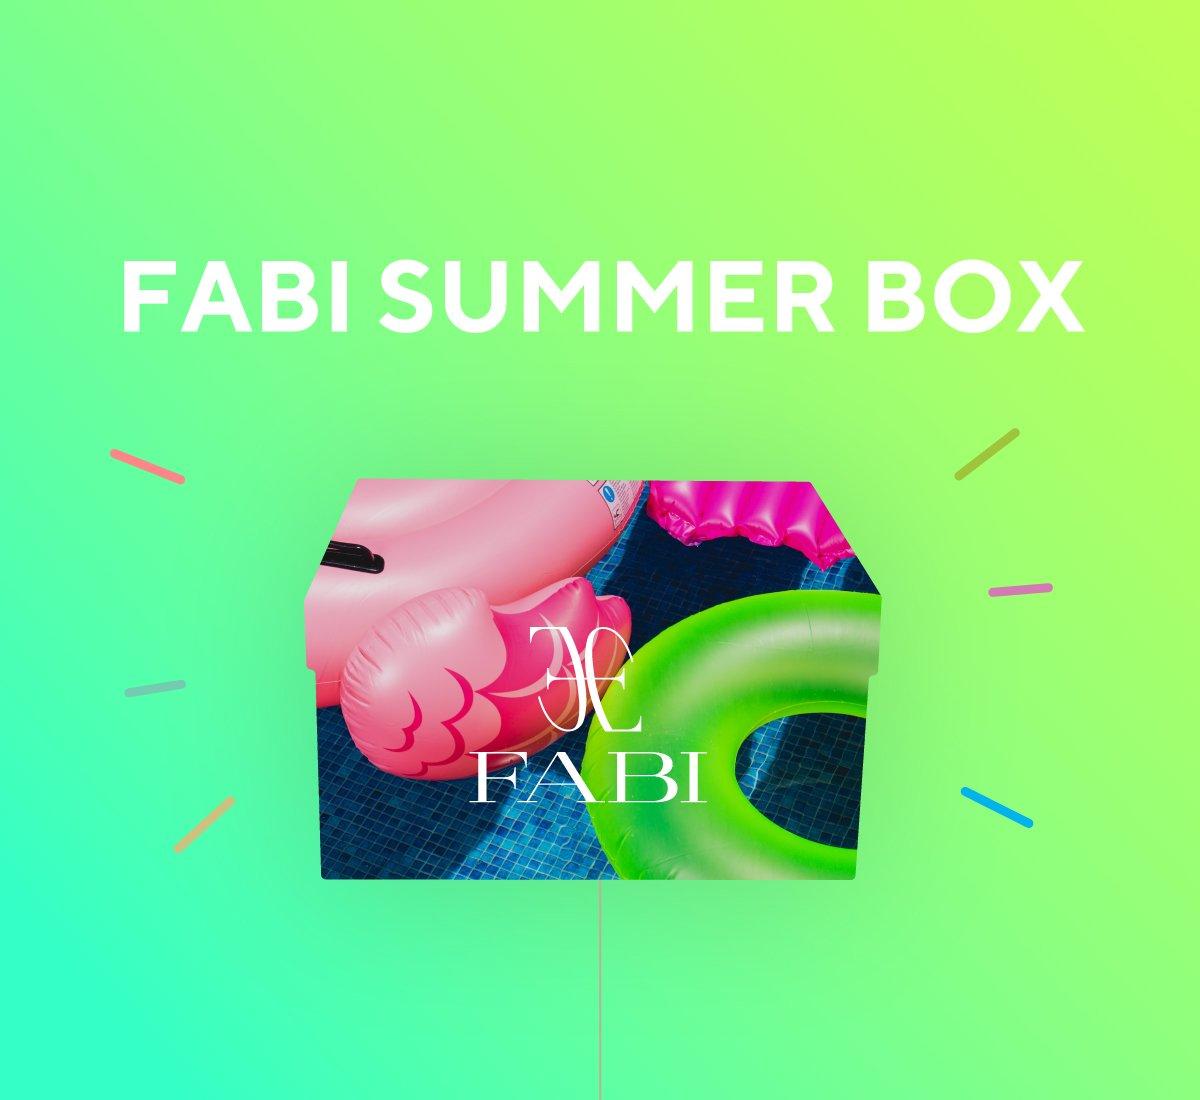 MAN FABI SUMMER BOX